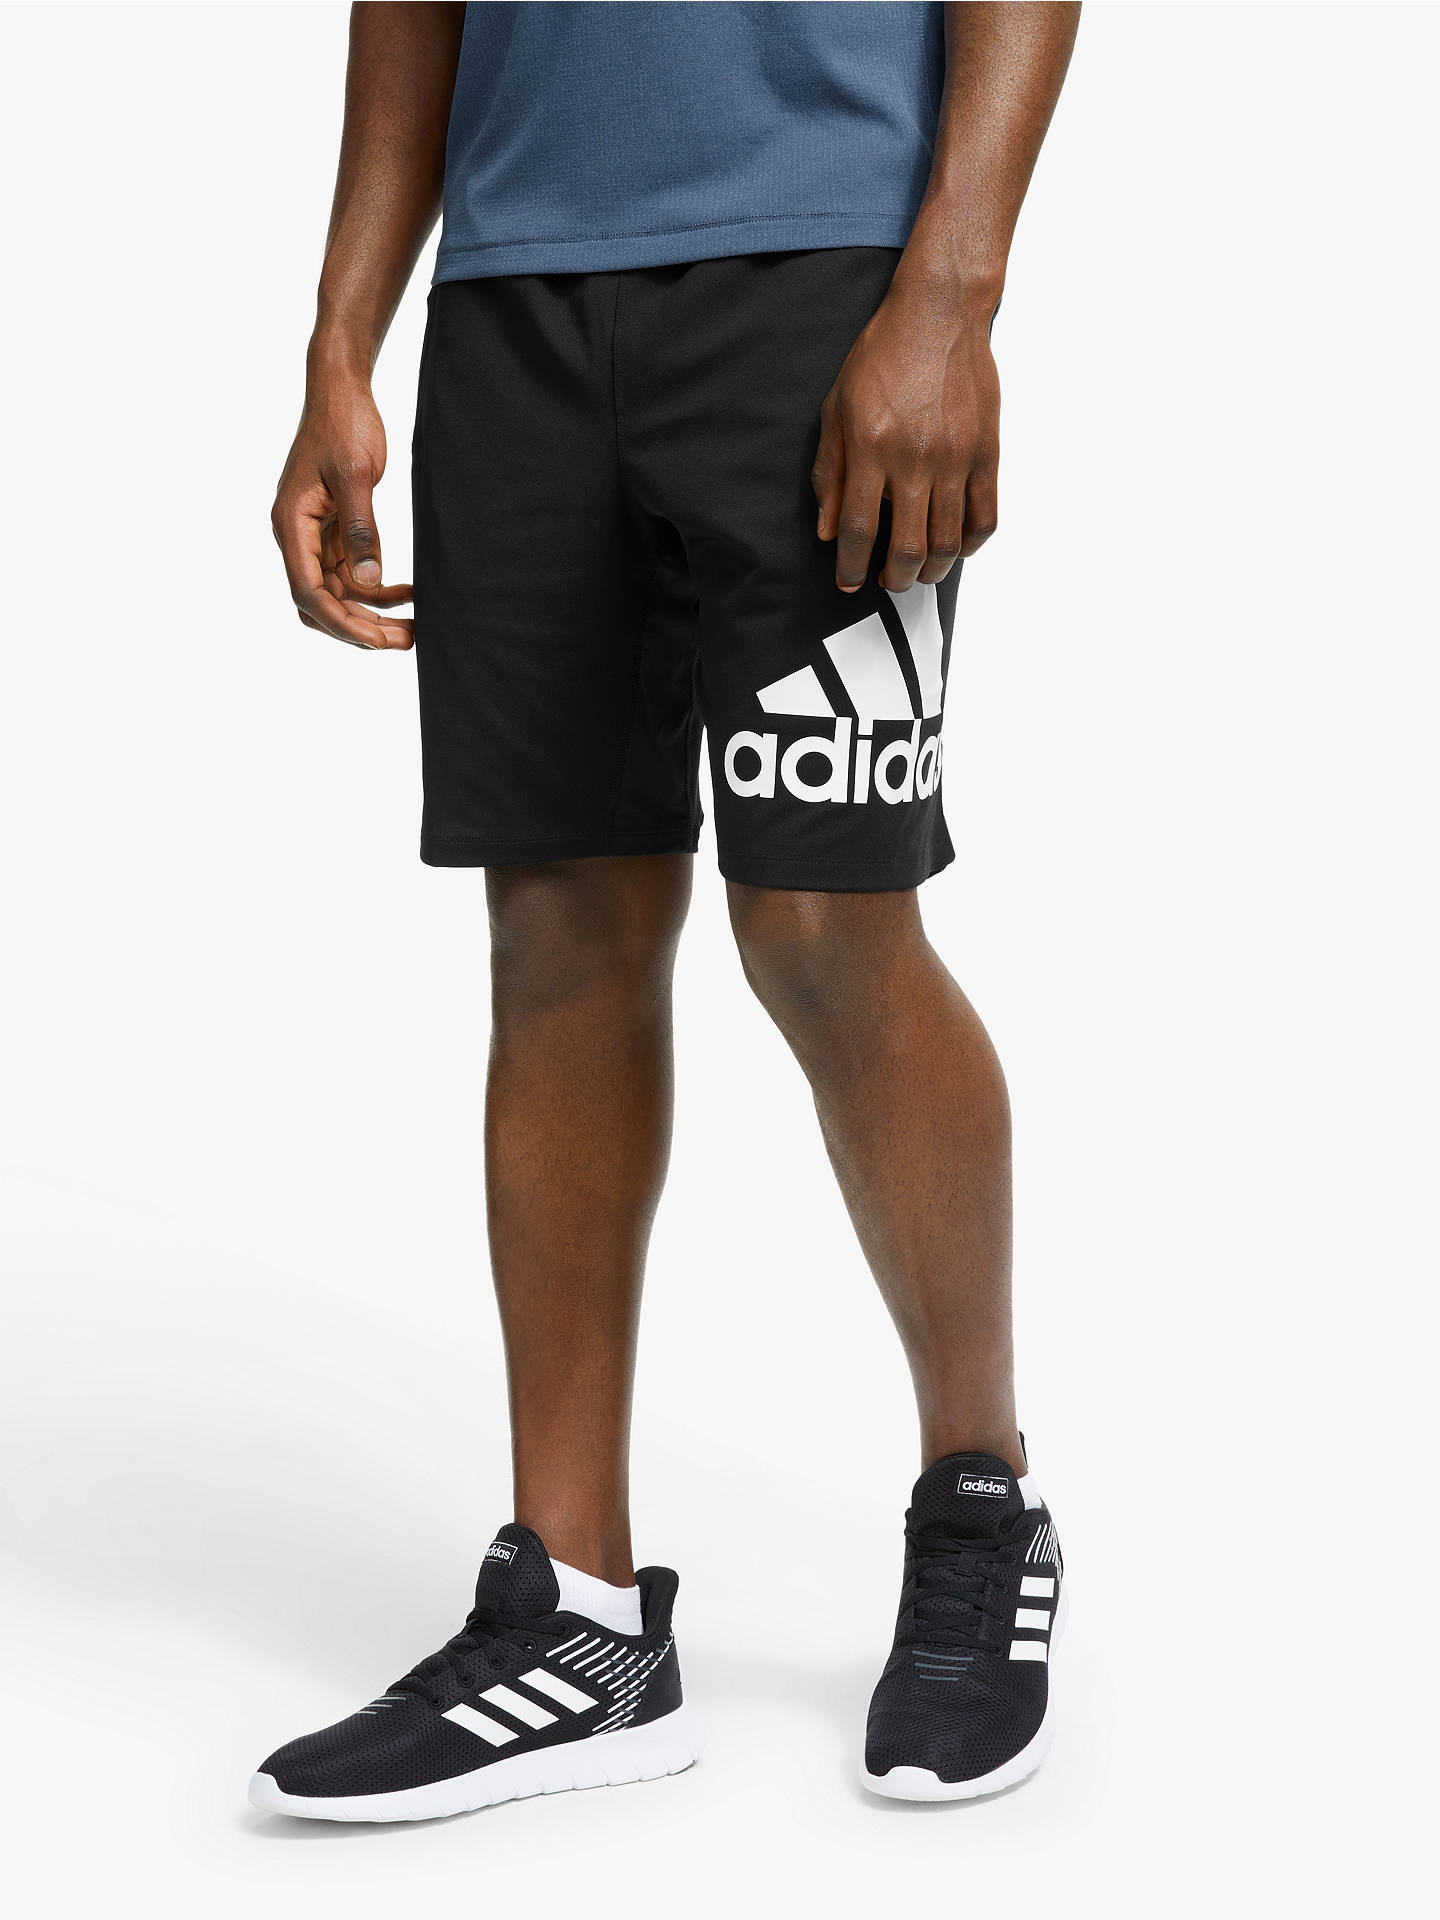 08dd3f6c3 Buy adidas 4KRFT Badge of Sport Graphic Training Shorts, Black, XL Online  at johnlewis ...